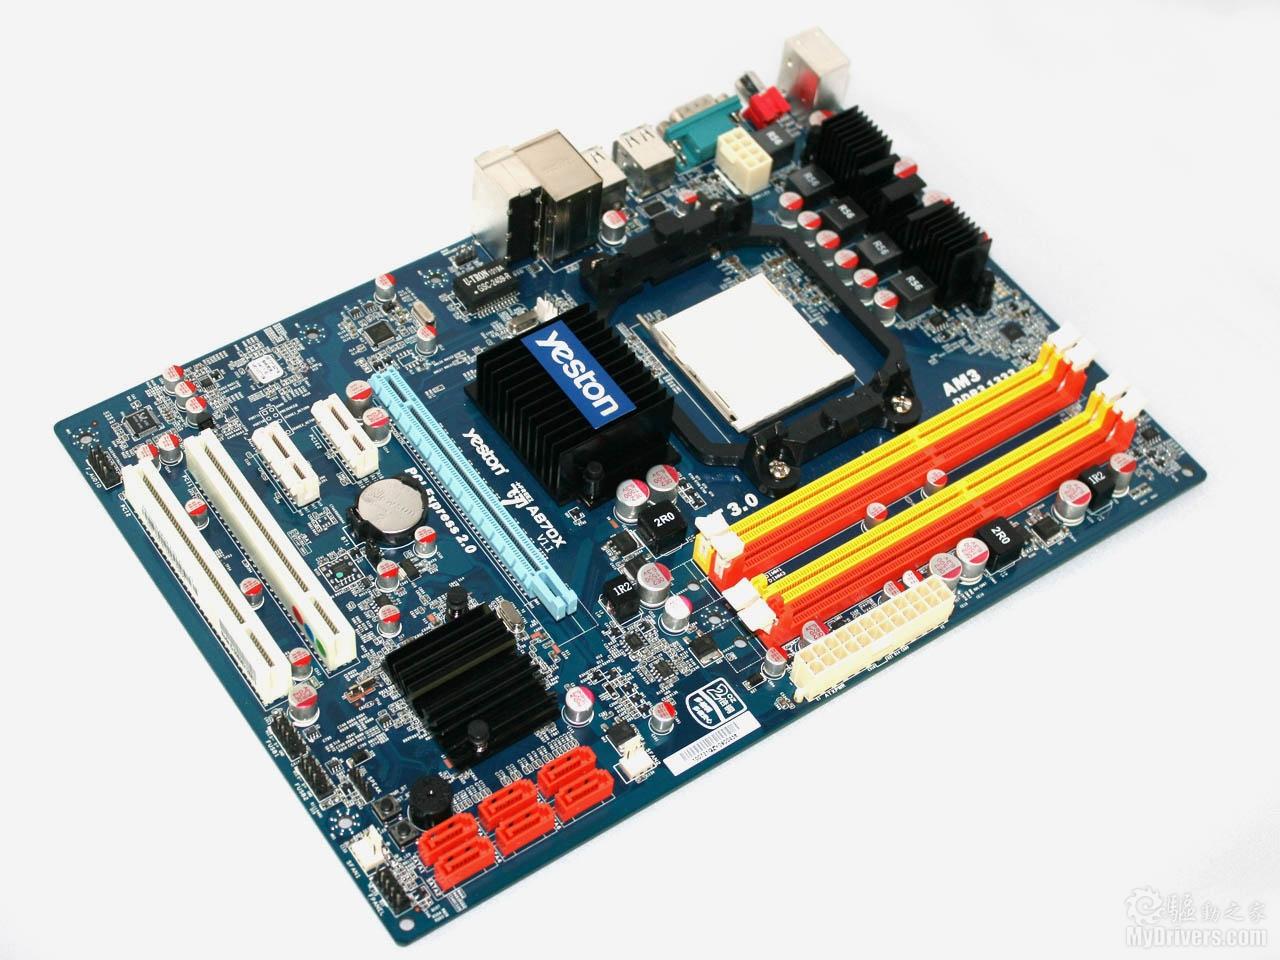 [3D性能测试及总结] 作为业界第一套基于DX10 的综合性基准测试工具,3DMark Vantage在发布前就早早地让众人翘首期盼了。它能全面多核心处理器、发挥多路显卡的优势,能在当前和未来一段时间内满足PC系统游戏性能测试的需求。3DMark Vantage是专门为DX10显卡量身打造的,而且只能运行在Windows Vista SP1操作系统下。它包括两个图形测试项目、两个处理器测试项目、六个特性测试项目。借助于DX10 API的新技术和高效能,它为玩家带来了一场绚丽逼真的视觉特效盛宴。并且,3DM